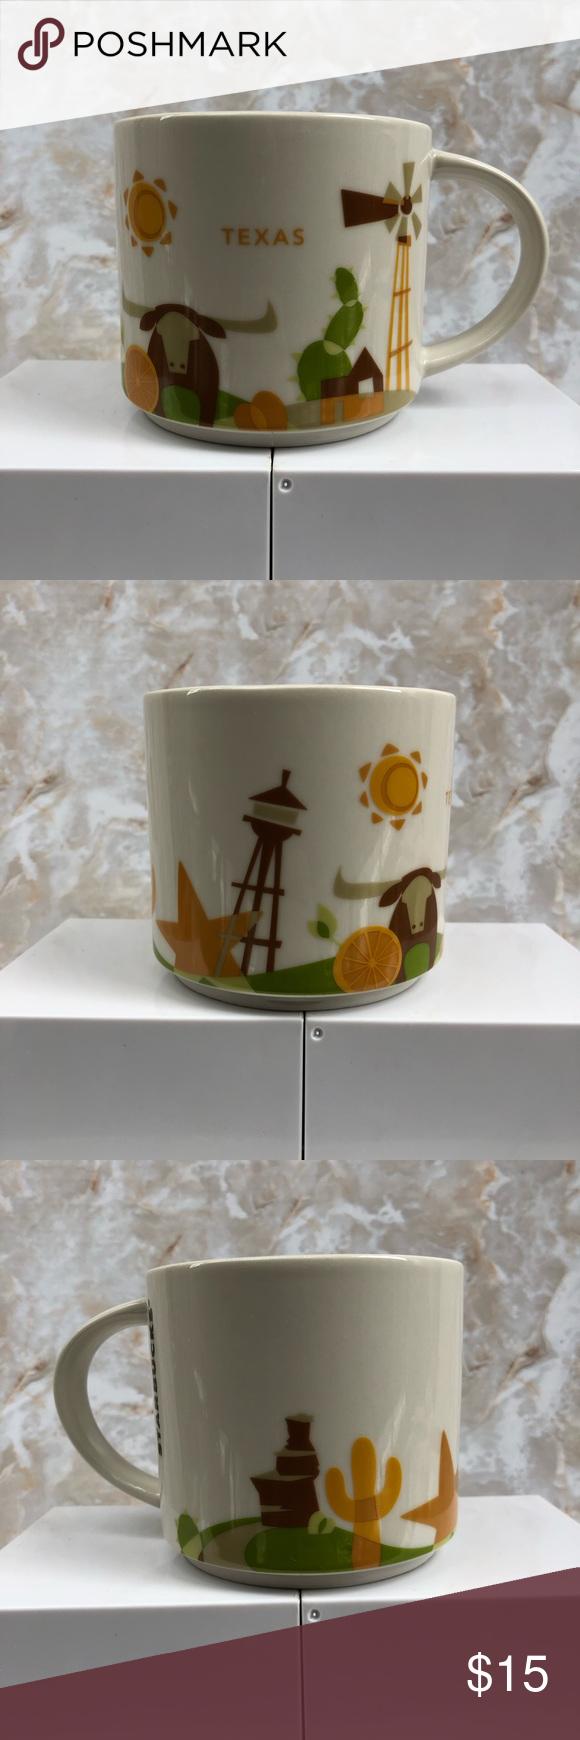 STARBUCKS TEXAS COFFEE CUP COLLECTION Starbucks Texas